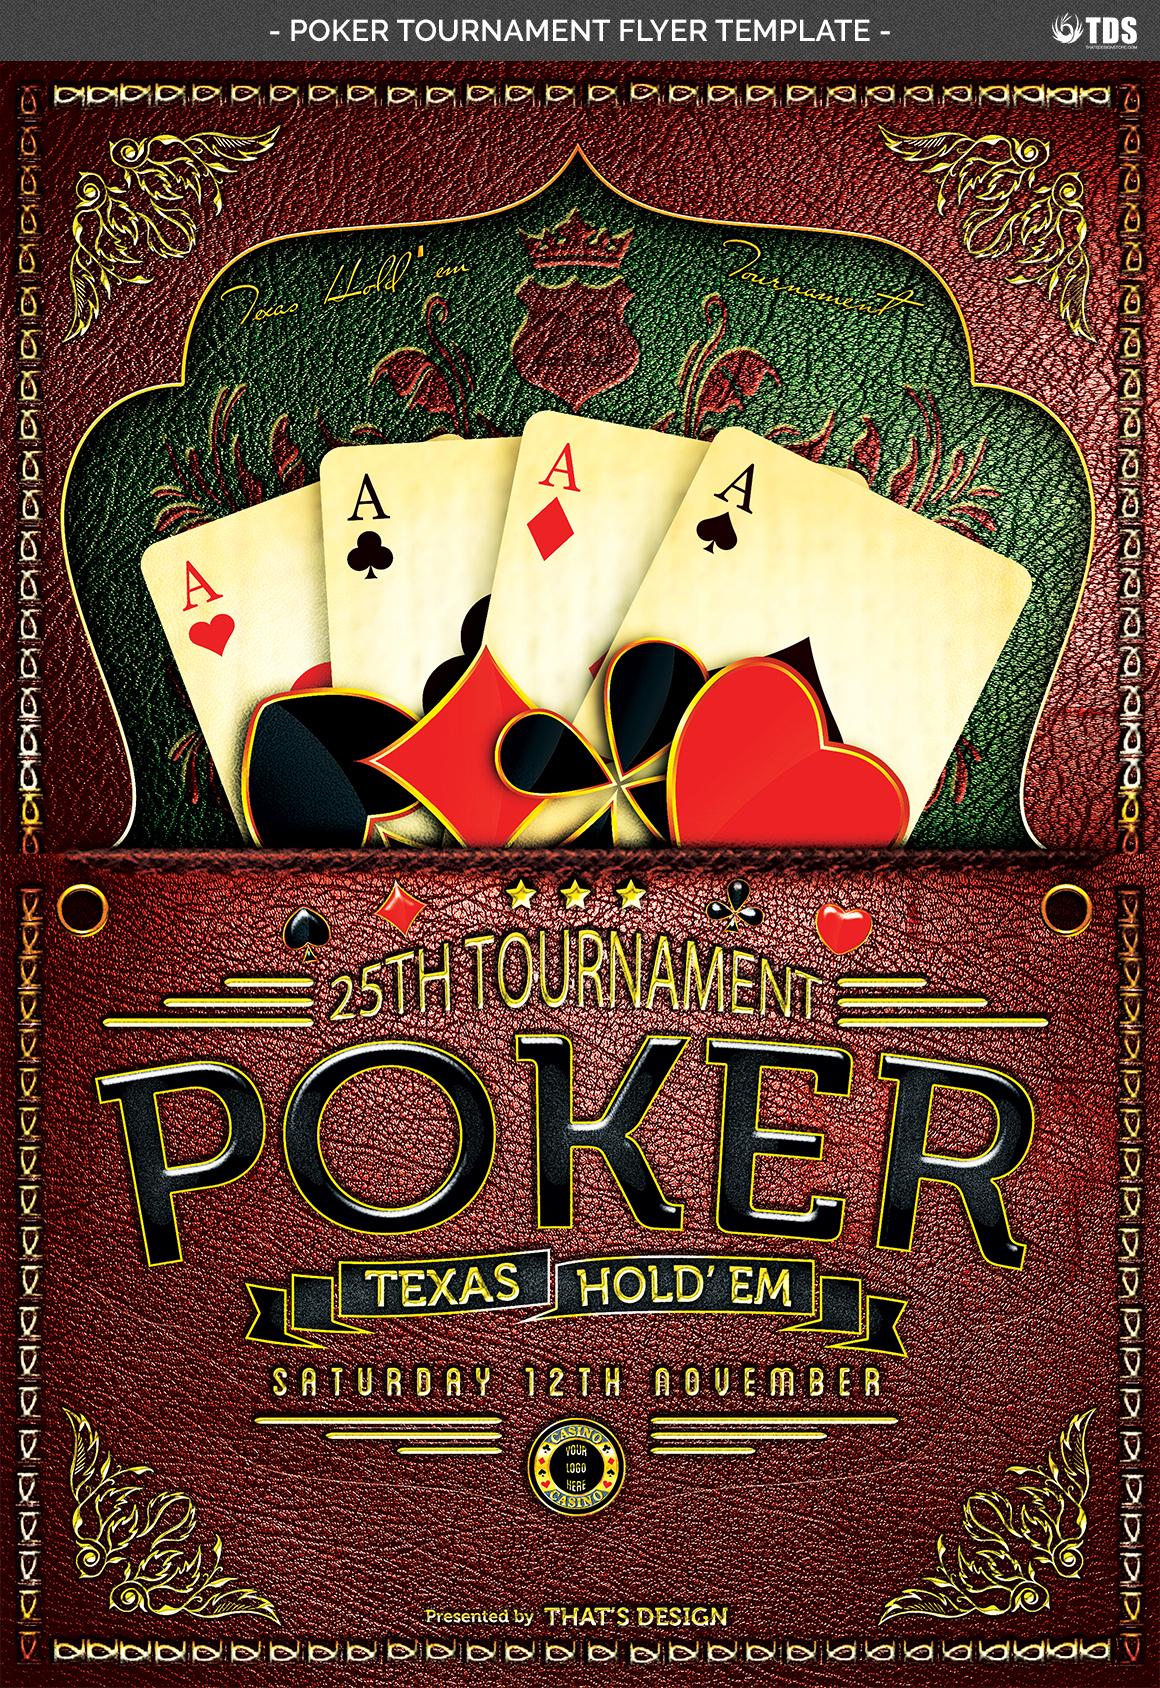 Poker Tournament Flyer Template By Tdst Design Bundles